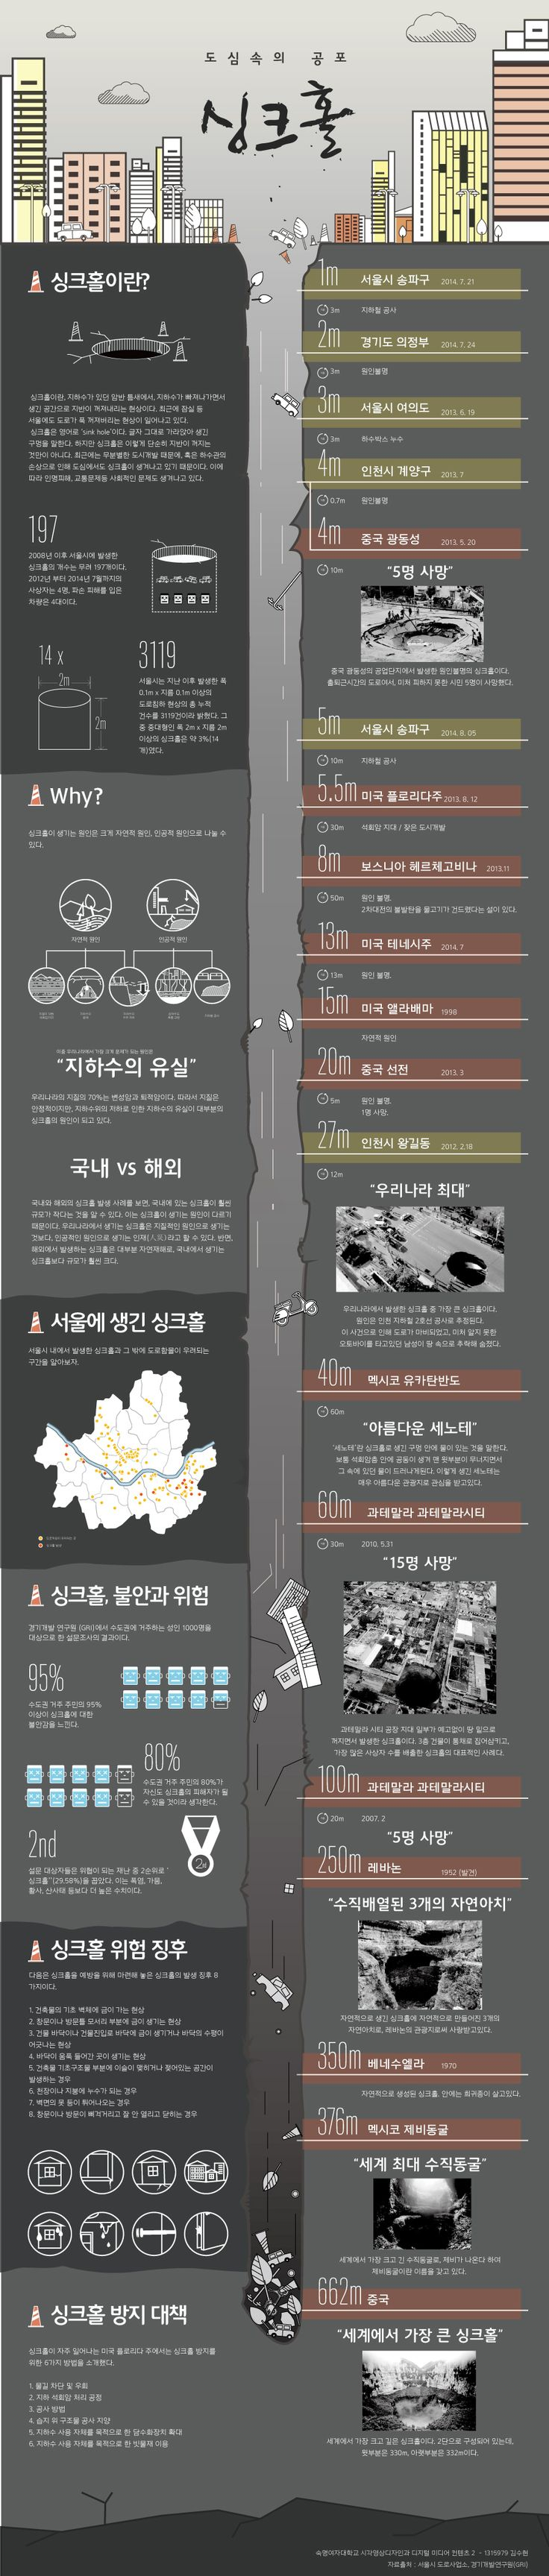 2014 Digital Media Contents 디미컨 중간 과제 인포그래픽. 싱크홀 #infographic #sinkhole design by #suhyeonkim